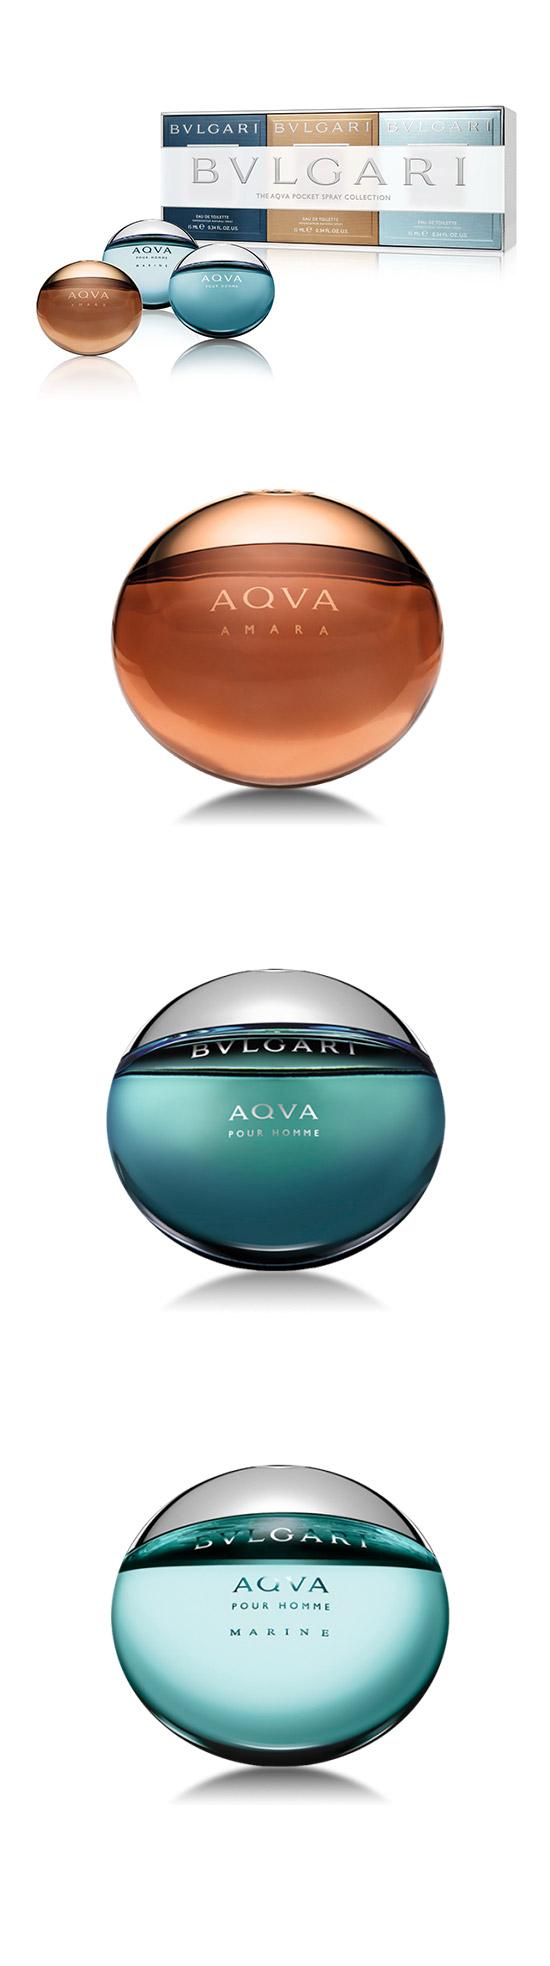 【FINAL CALL】BVLGARI 寶格麗 AQVA隨身香氛禮盒 (15ml*3入)